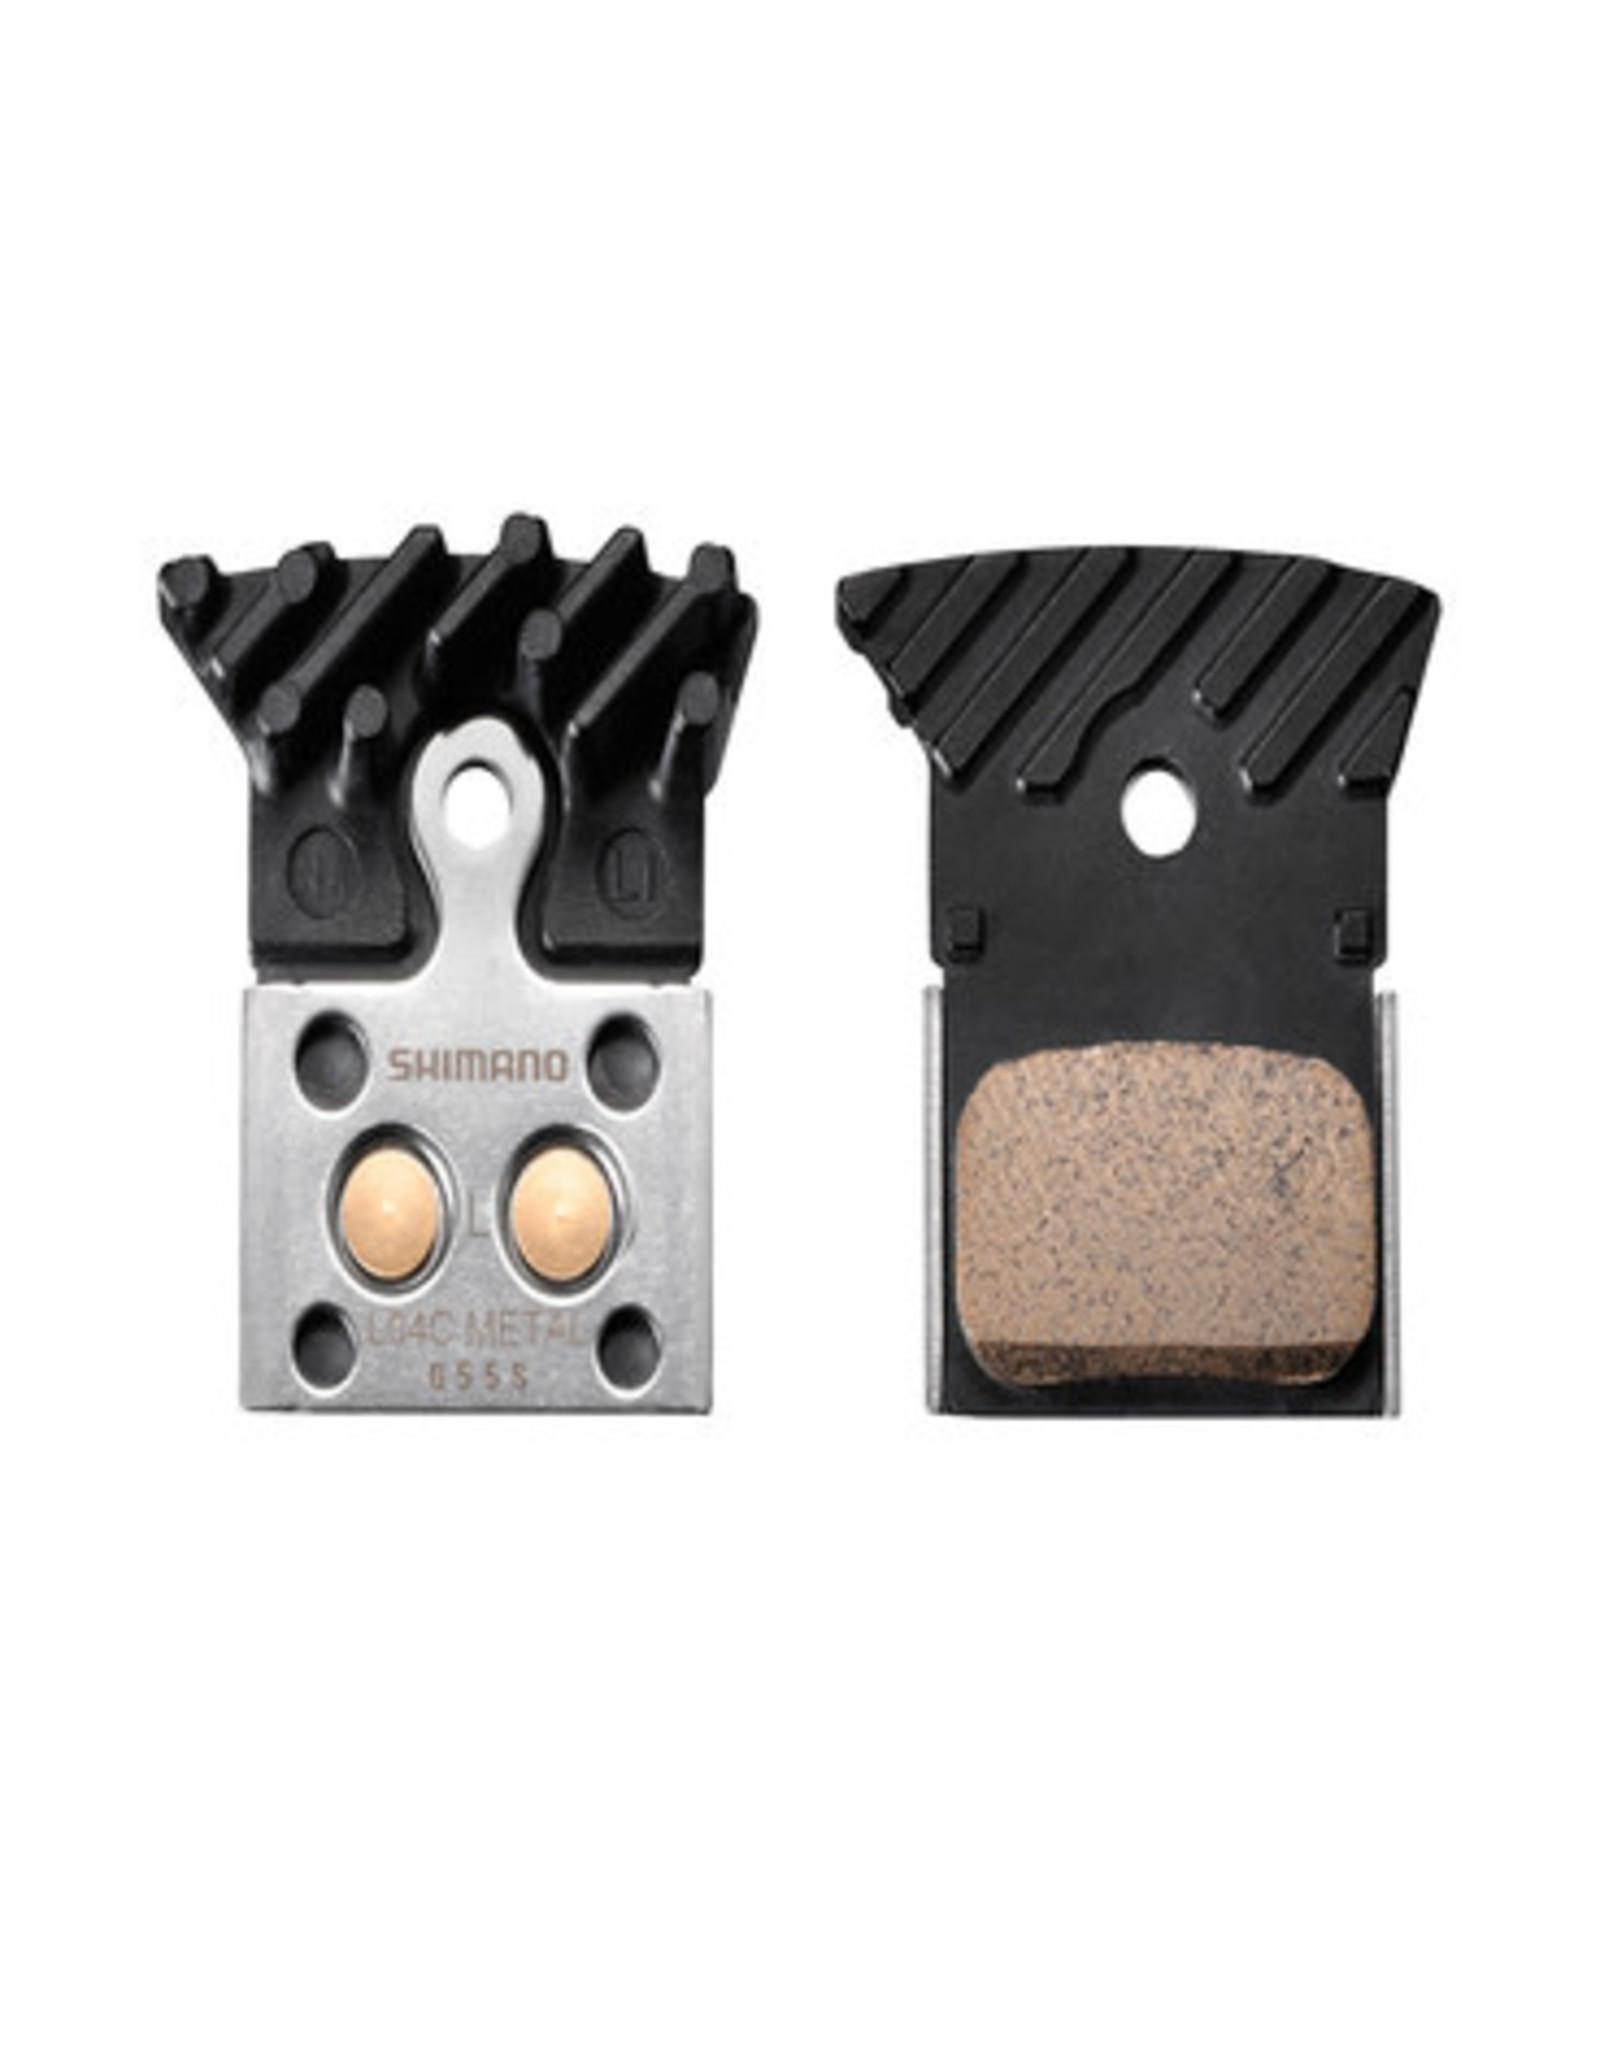 Shimano Brake pads Shim L04C metal Ice tech (Dura/Ulte/105)